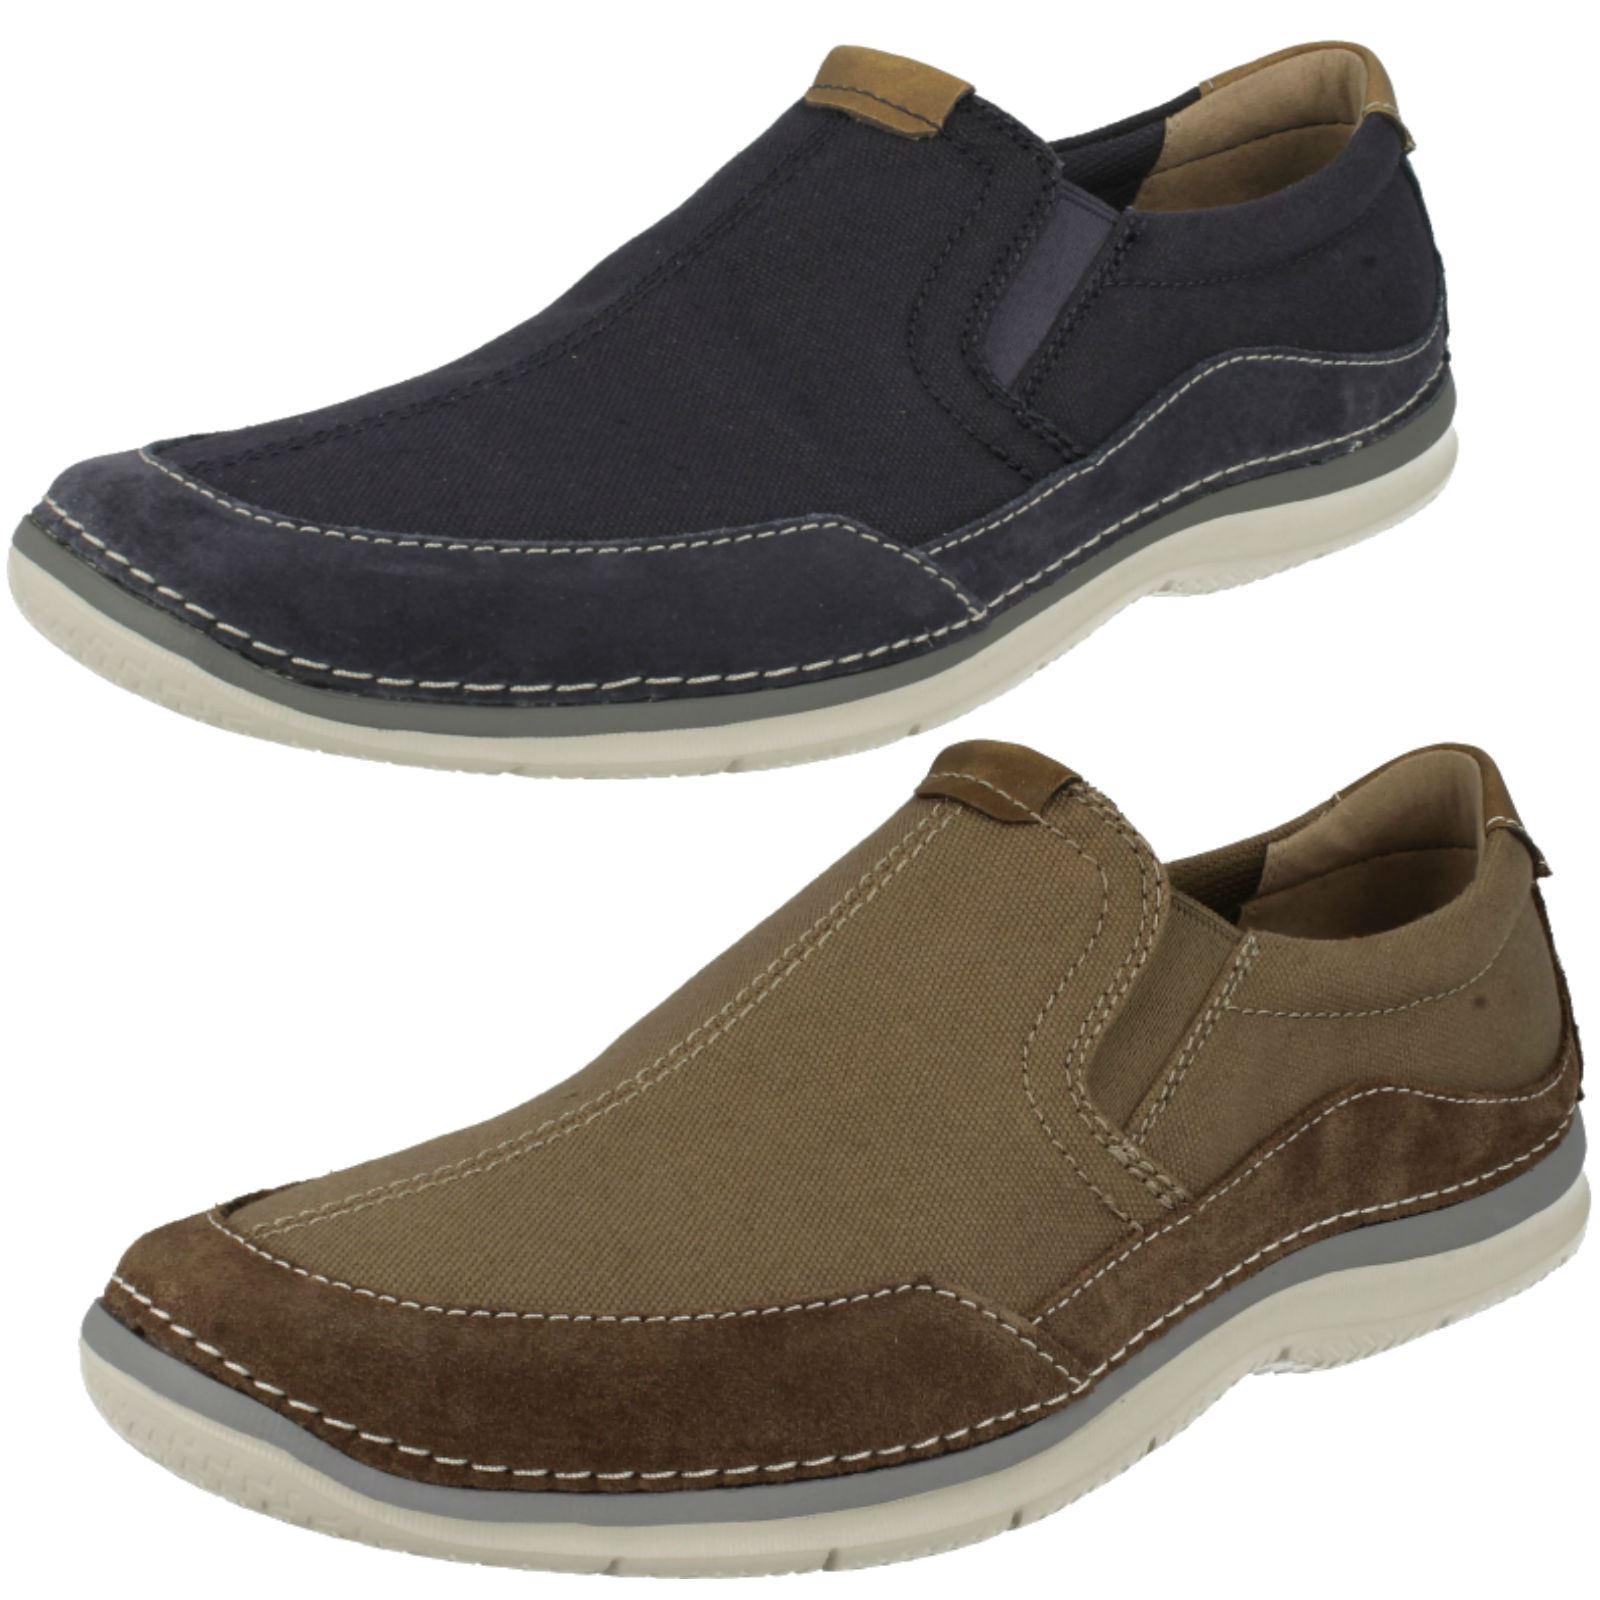 verde cuero On Free Clarks casual Olive Canvas zapatos hombre Slip de de Clarks Ripton para xgxZqw6